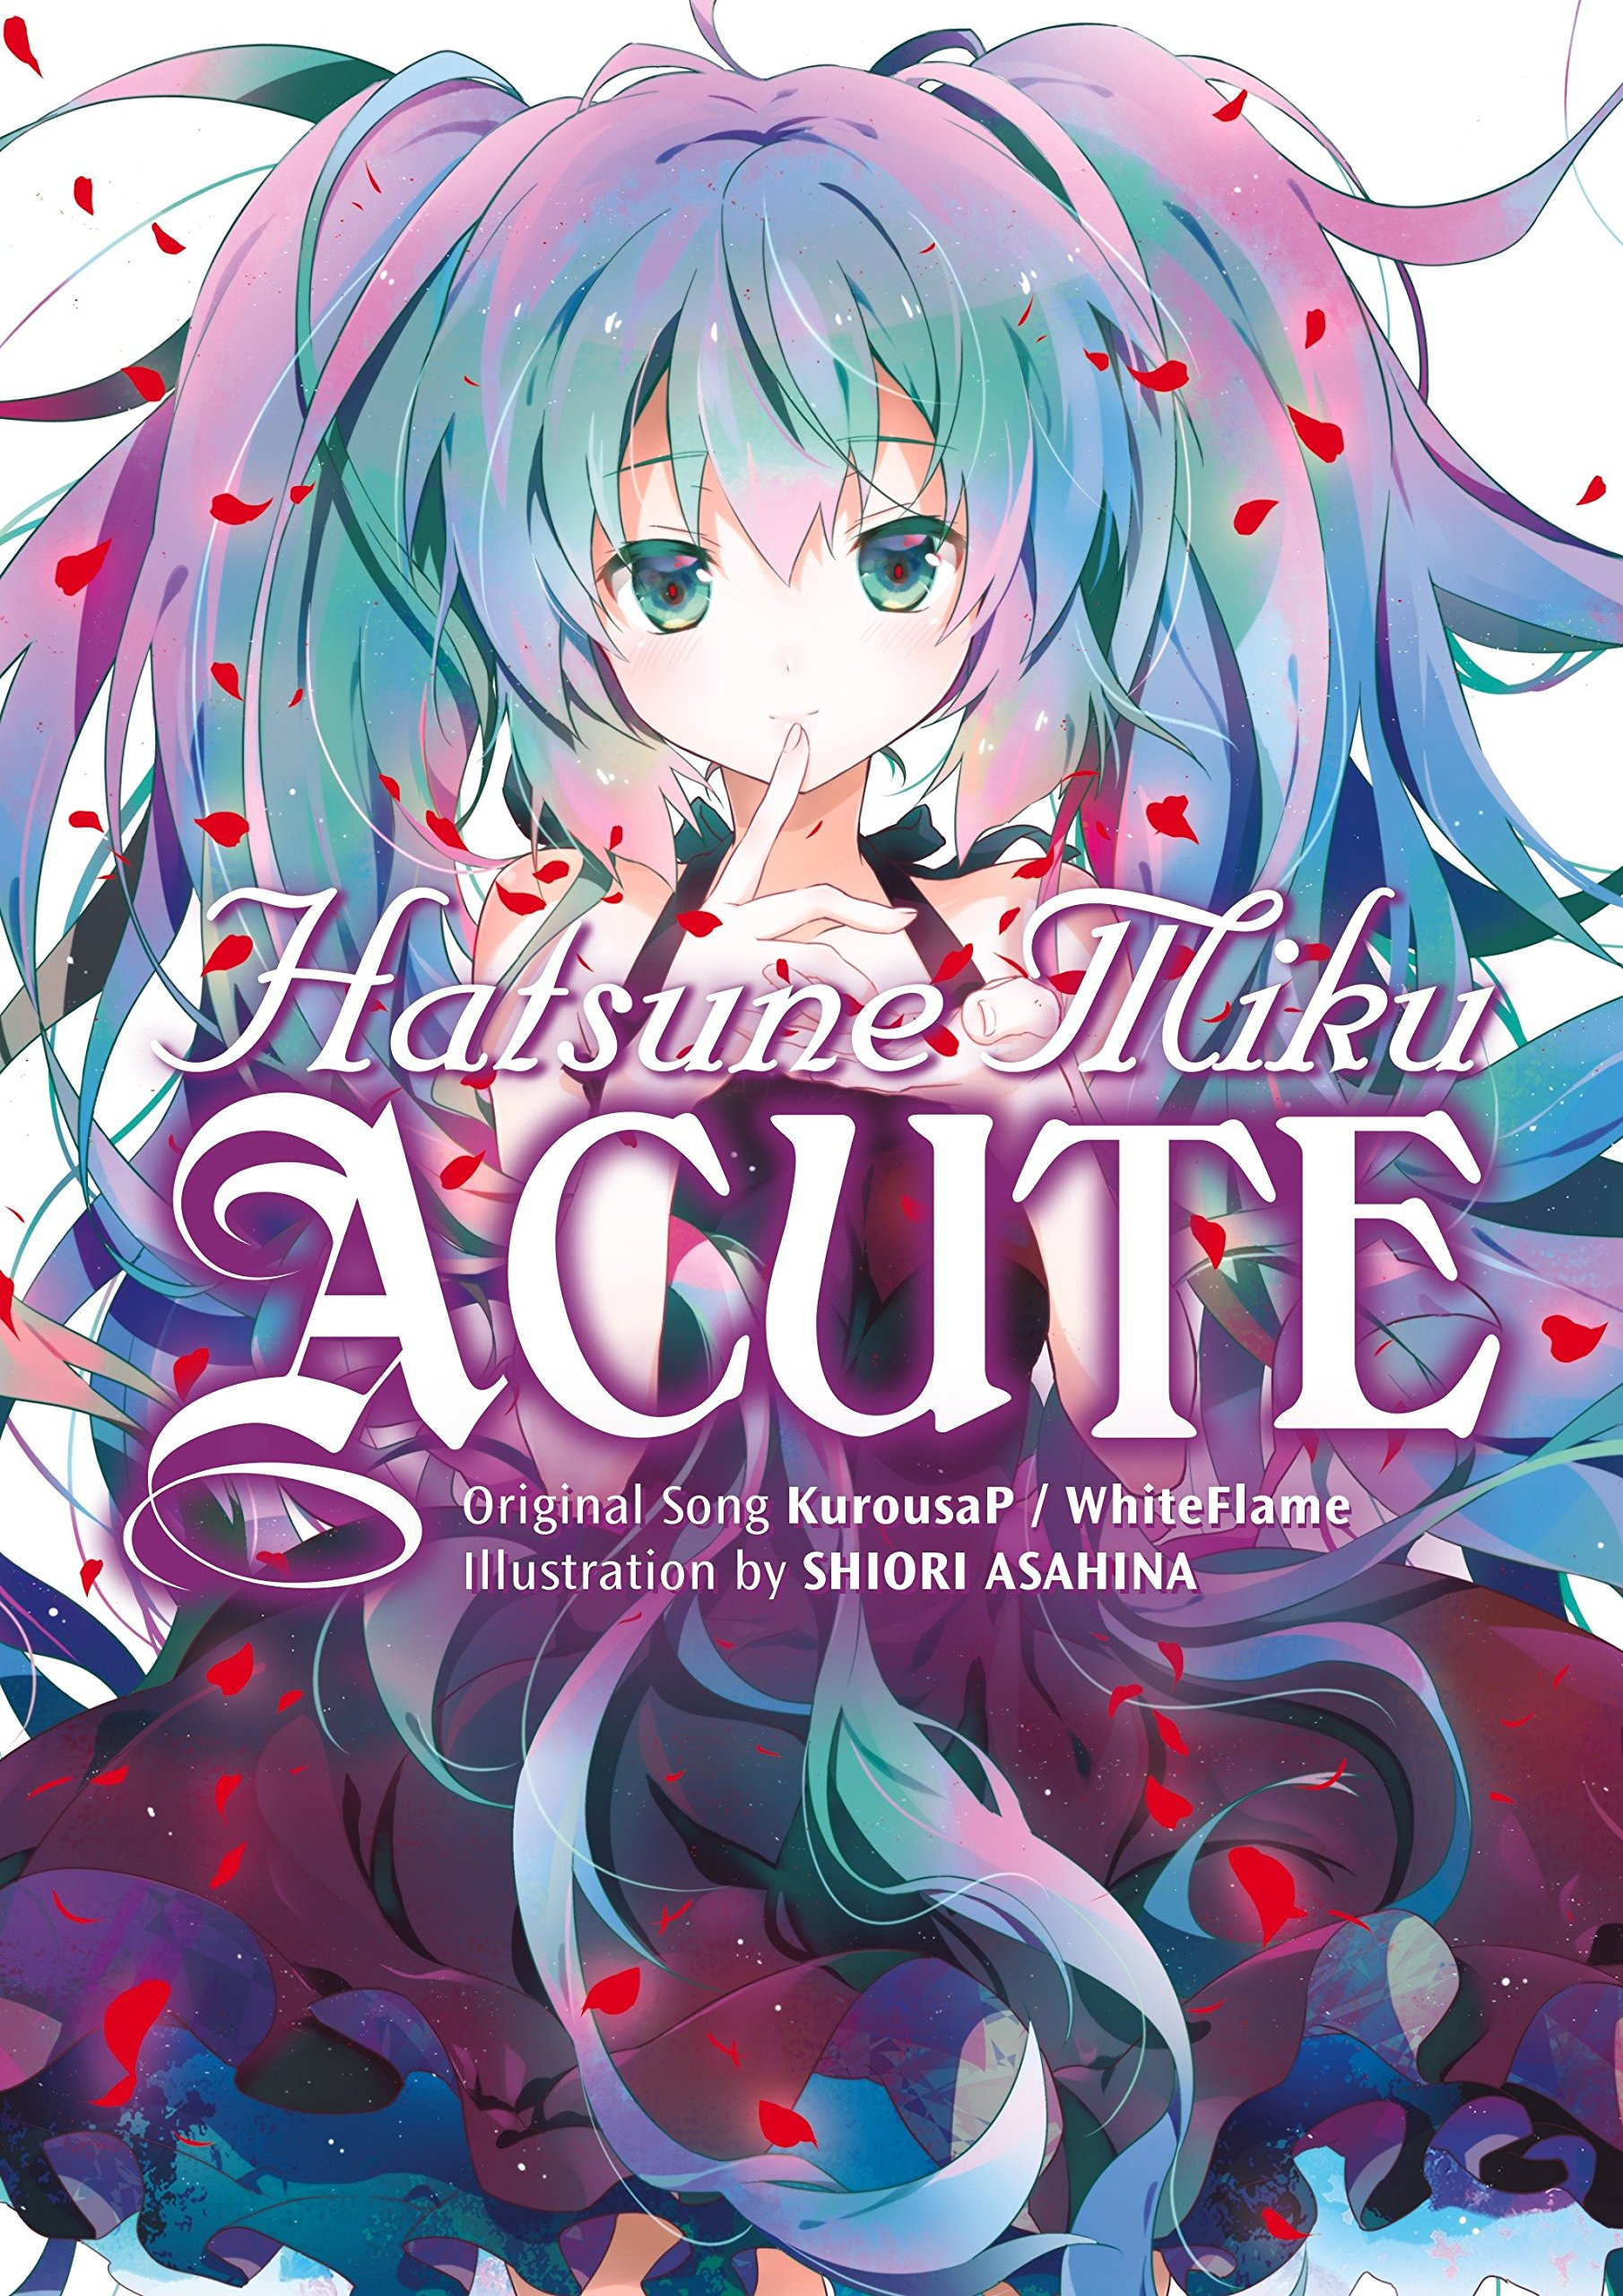 JAPAN Kei manga Hatsune Miku Omnibus comic Project Diva